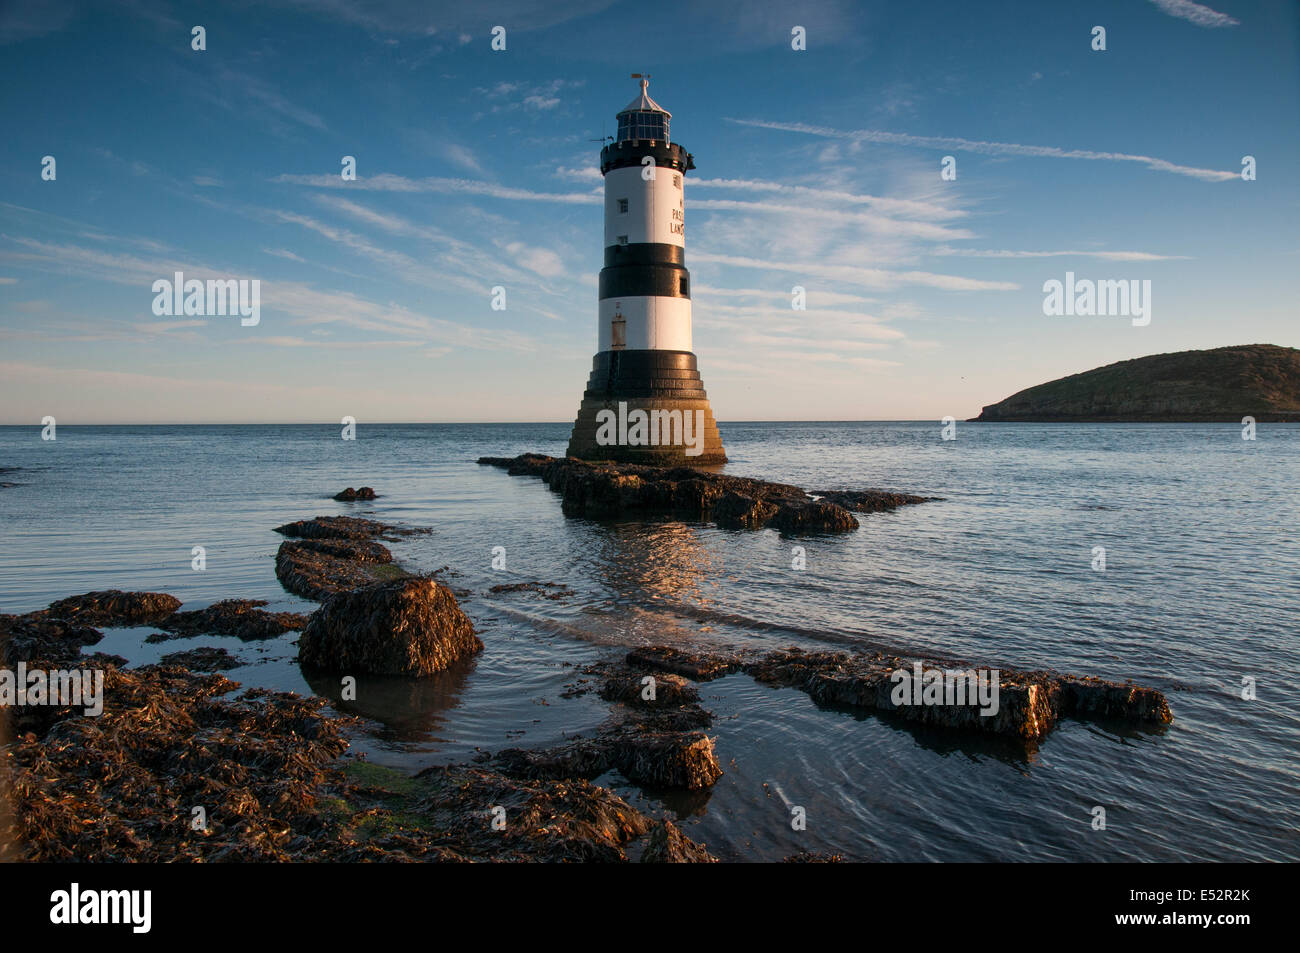 Autumn sunrise at Penmon Lighthouse, Anglesey Wales UK Stock Photo